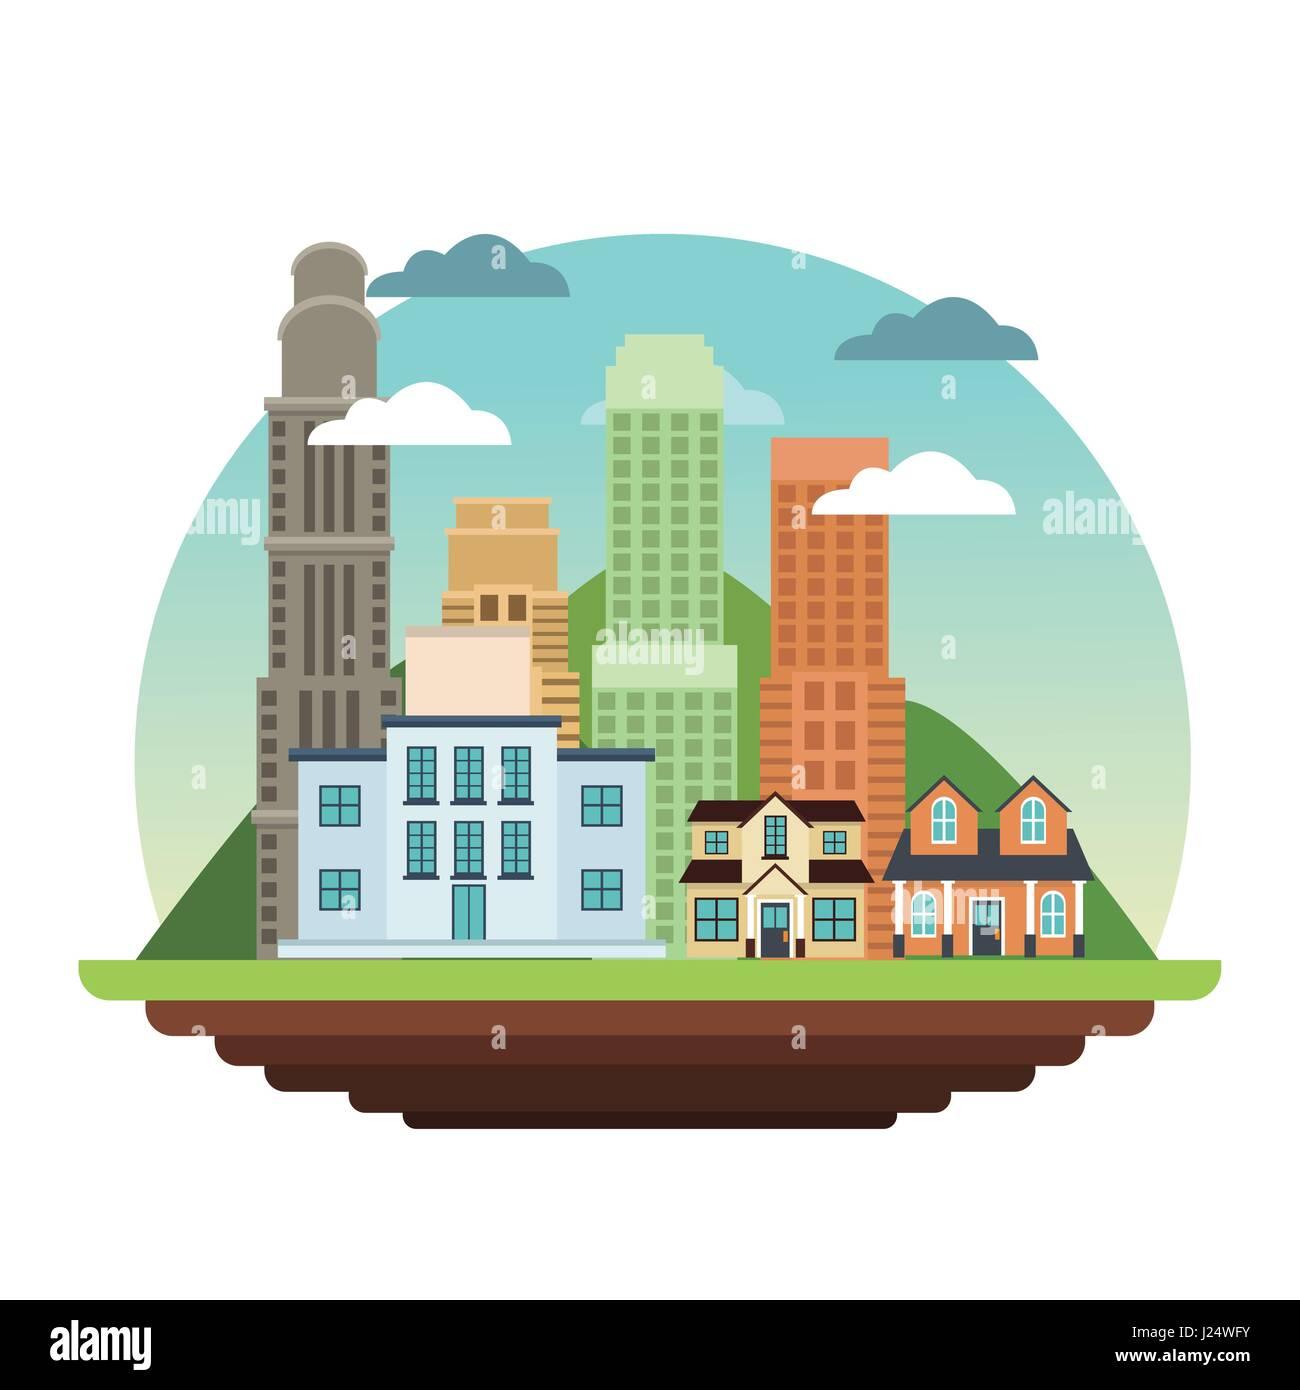 School buildings and house stock photos school buildings for Mountain designs garden city